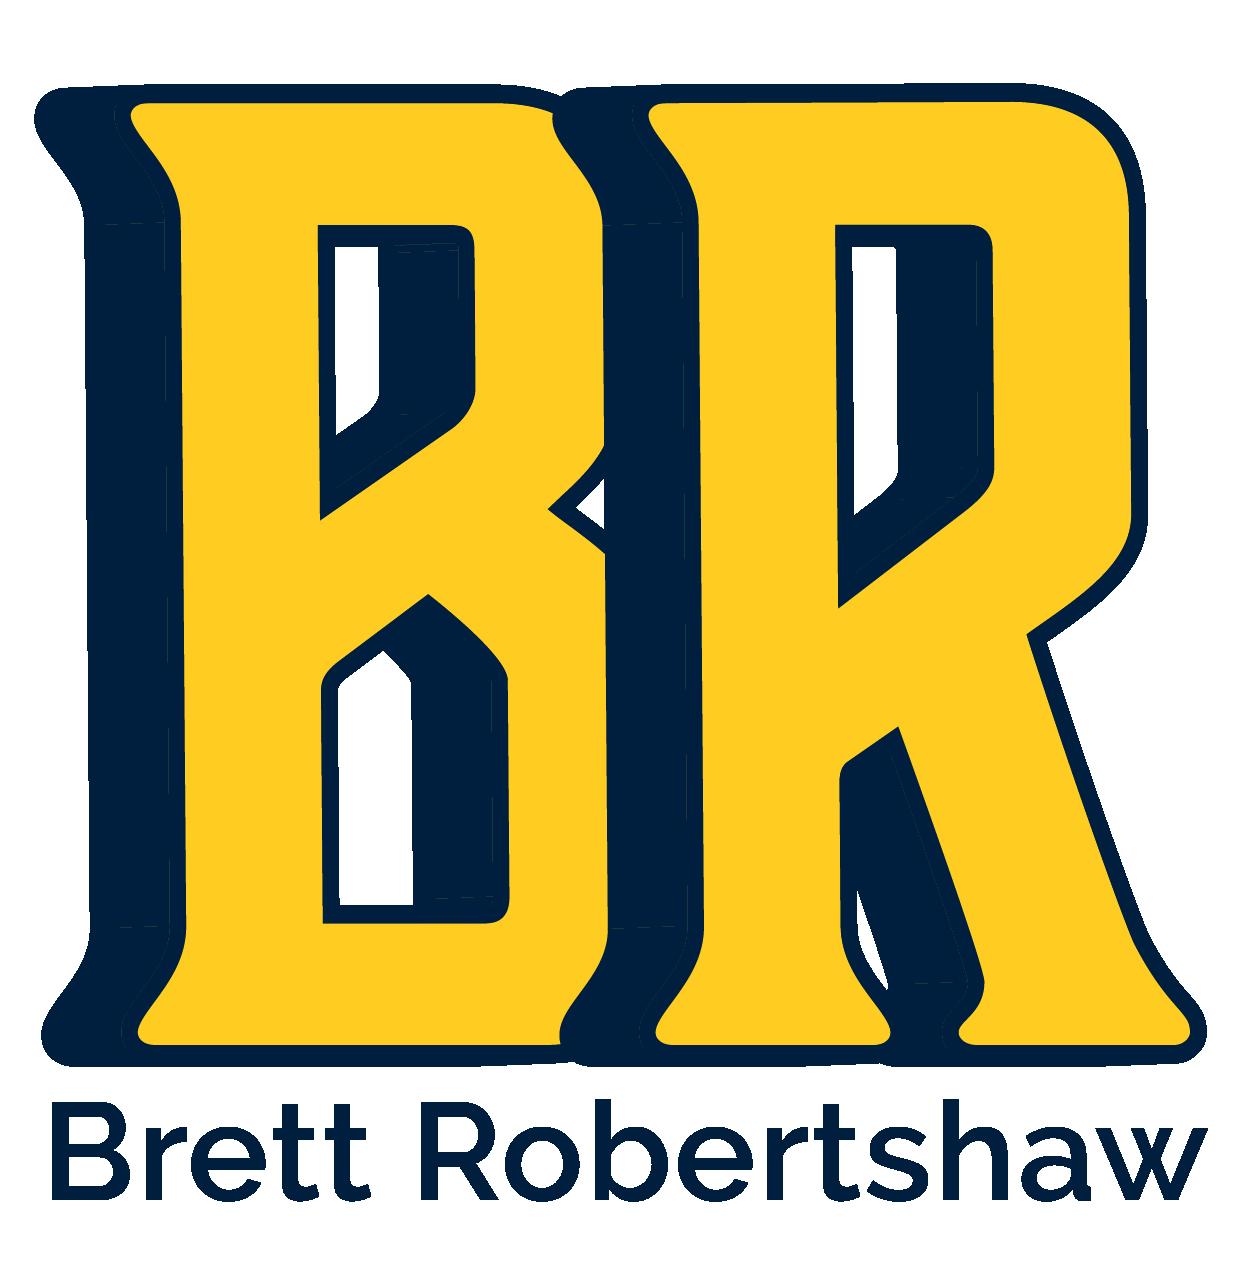 Brett Robertshaw